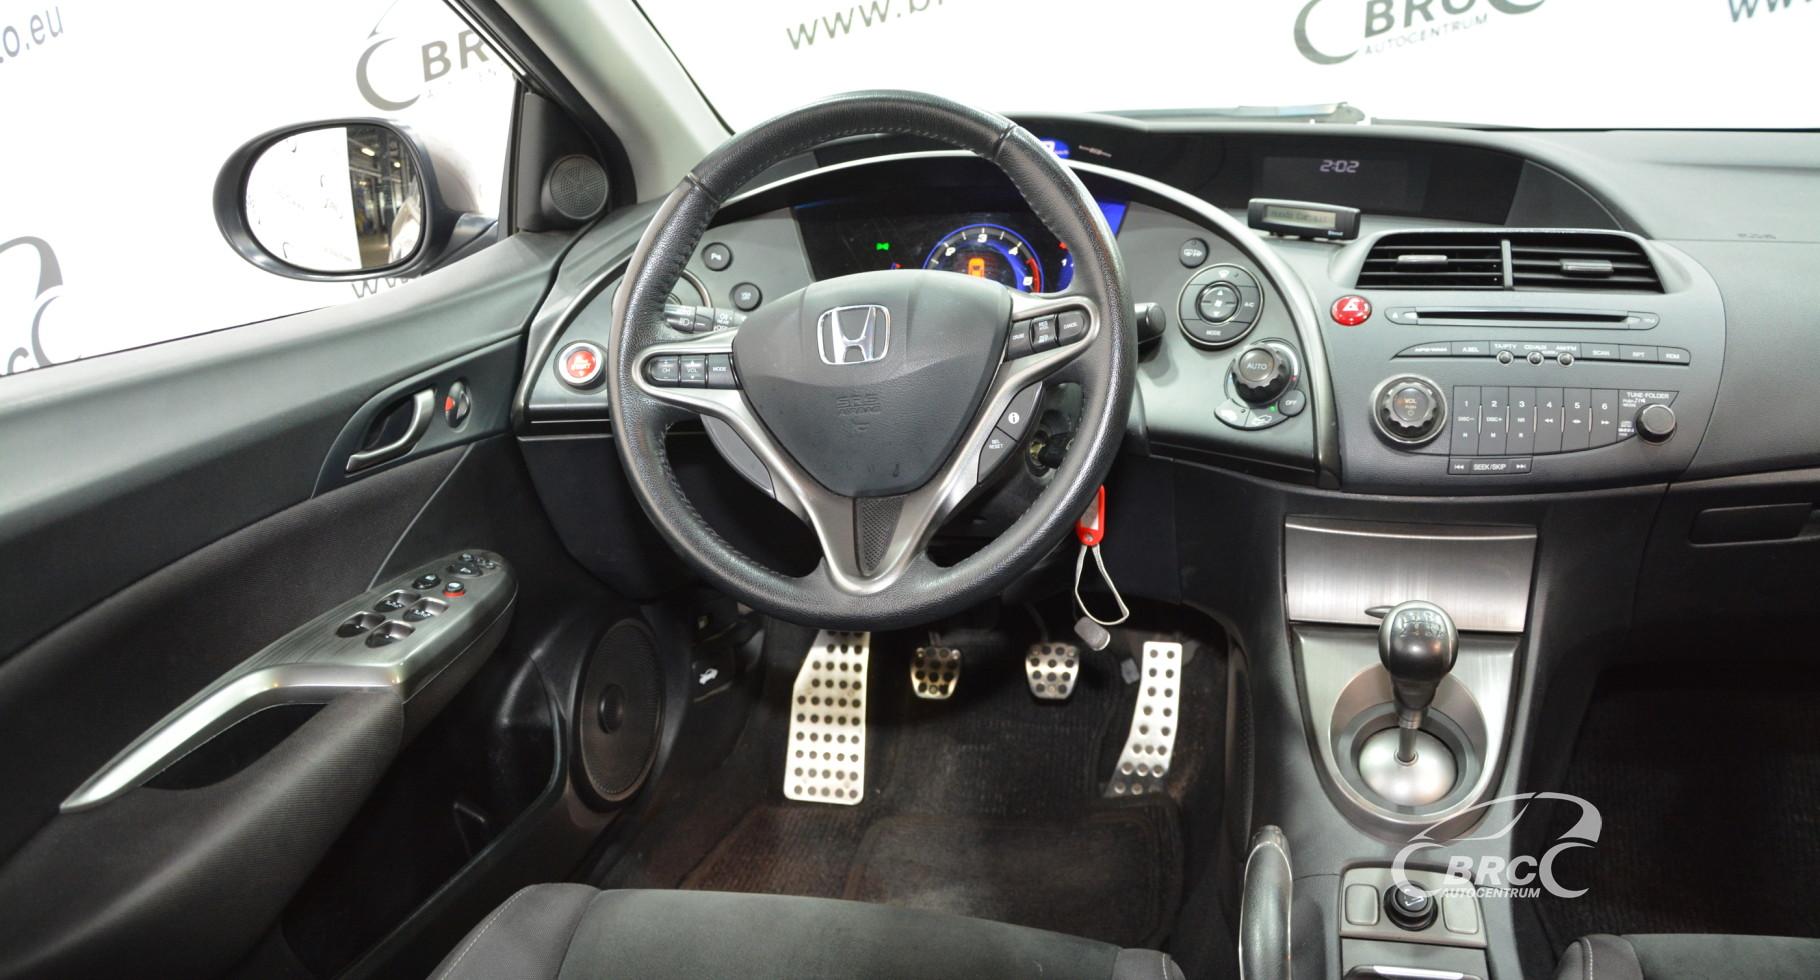 Honda Civic 2.2 i-CDTi